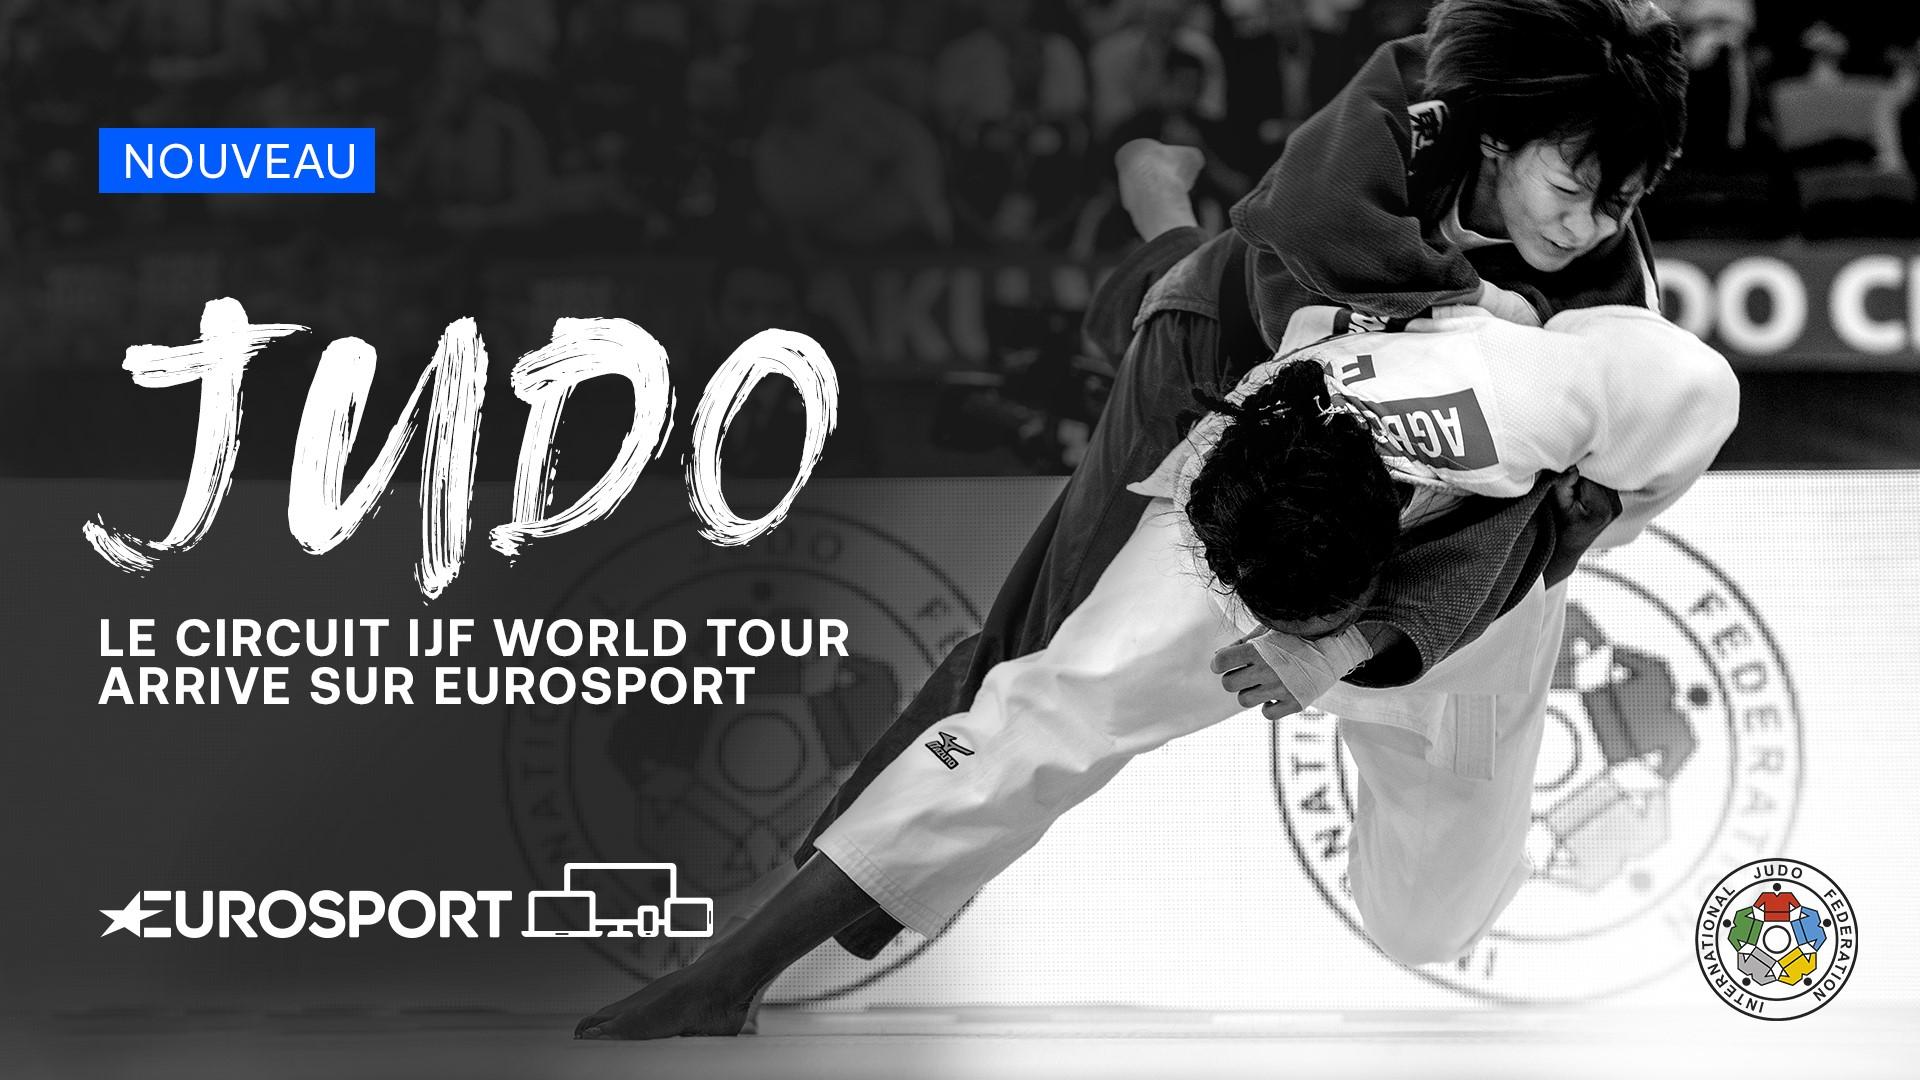 https://i.eurosport.com/2021/02/18/2997665.jpg